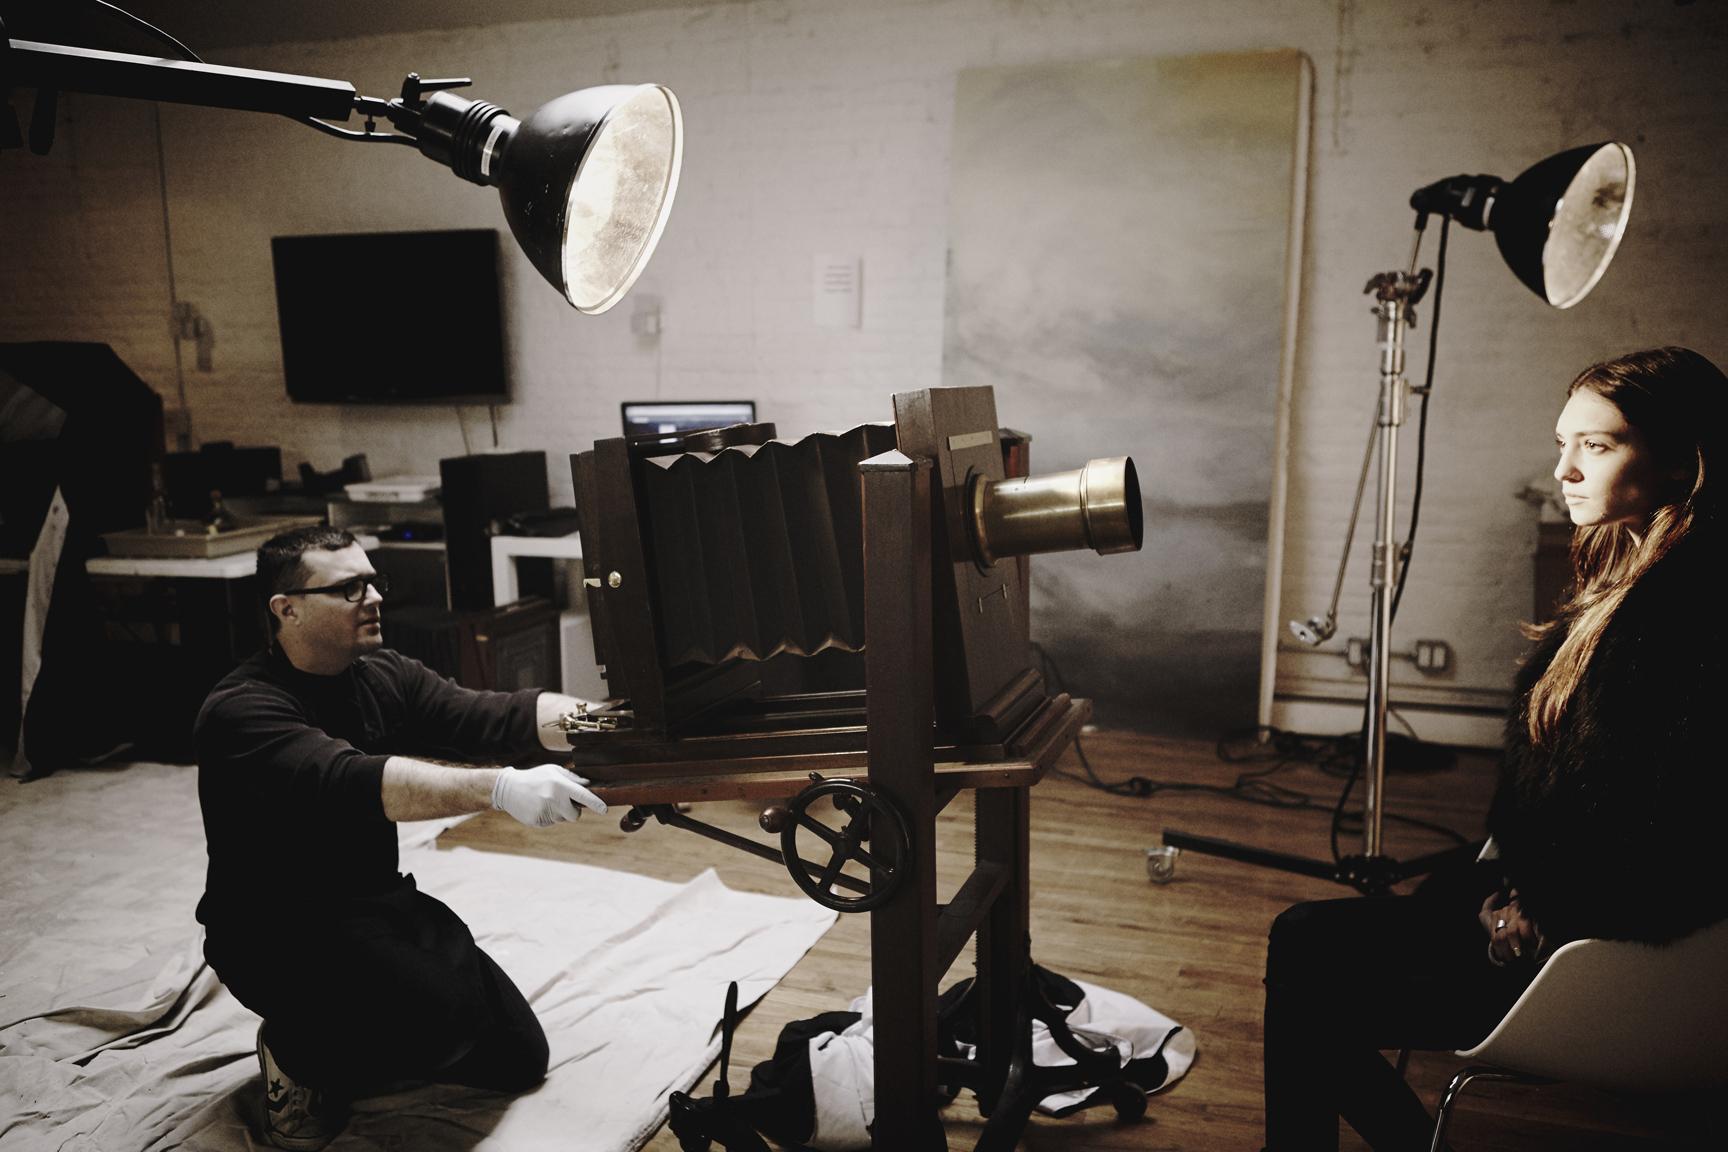 JAMES-WEBER-PHOTOGRAPHER-wetplate-collodion-13491.jpg